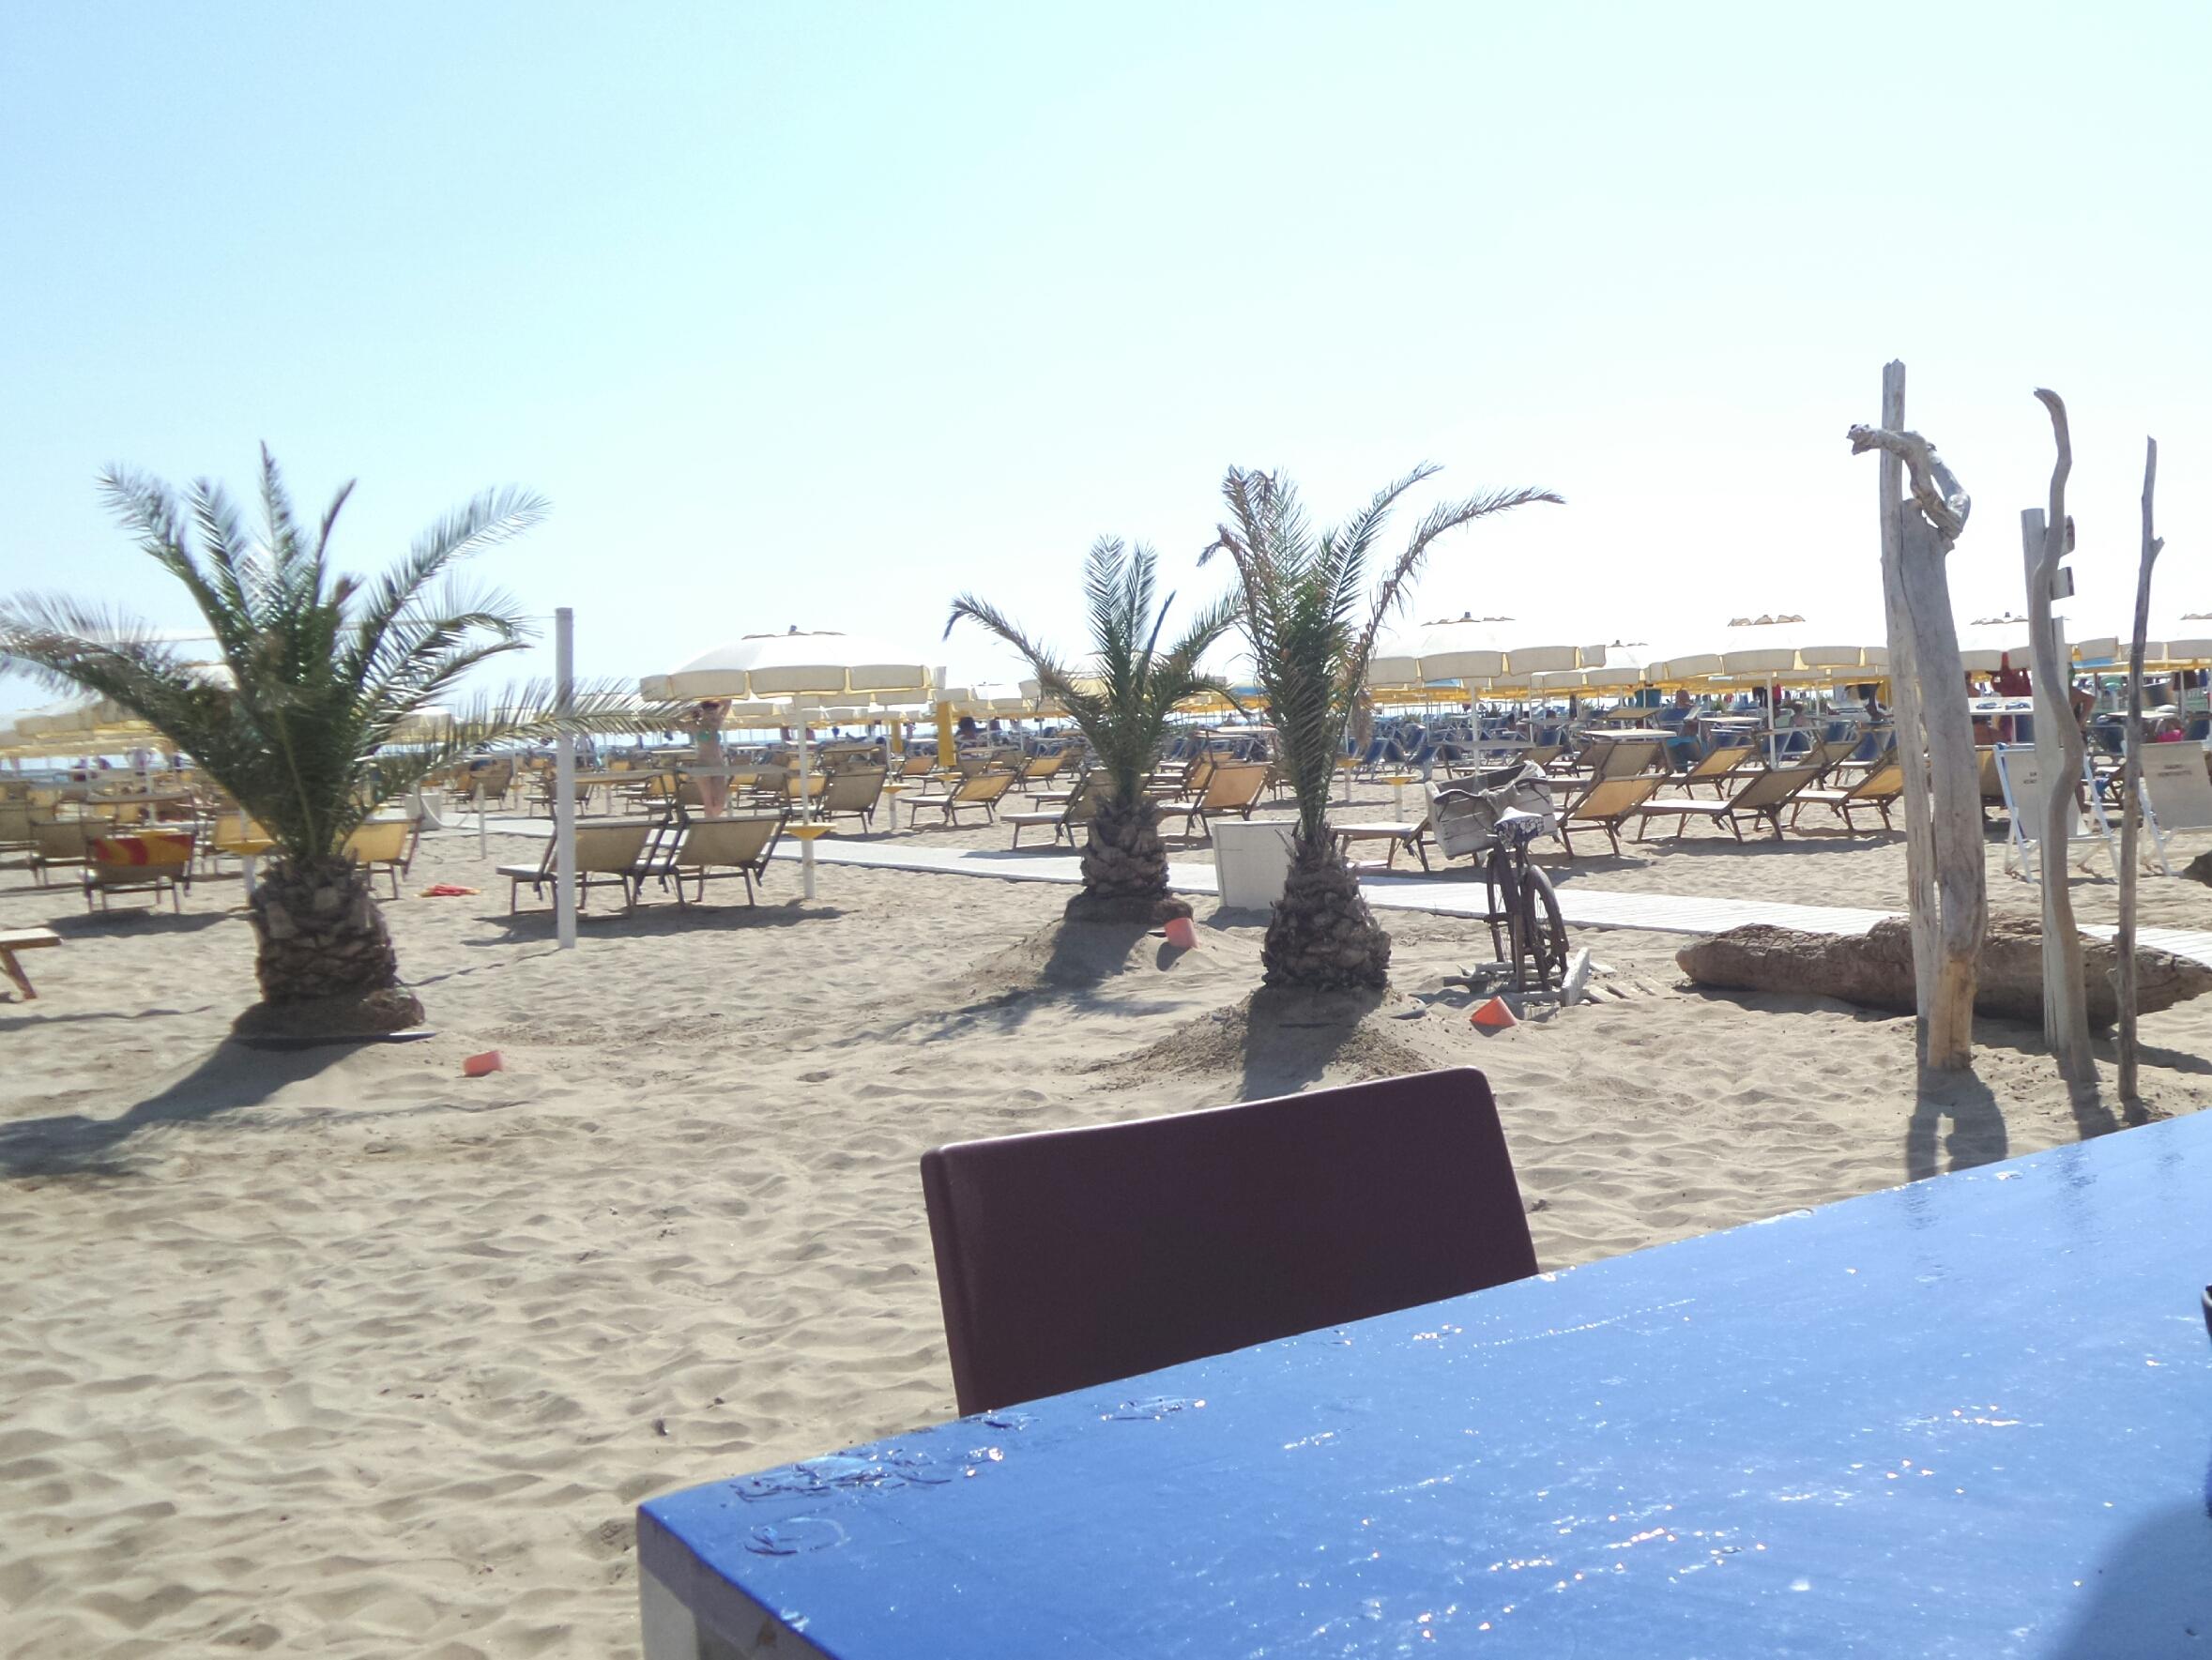 Rimini - Guida per un weekend in Riviera Romagnola   Just Me & The ...